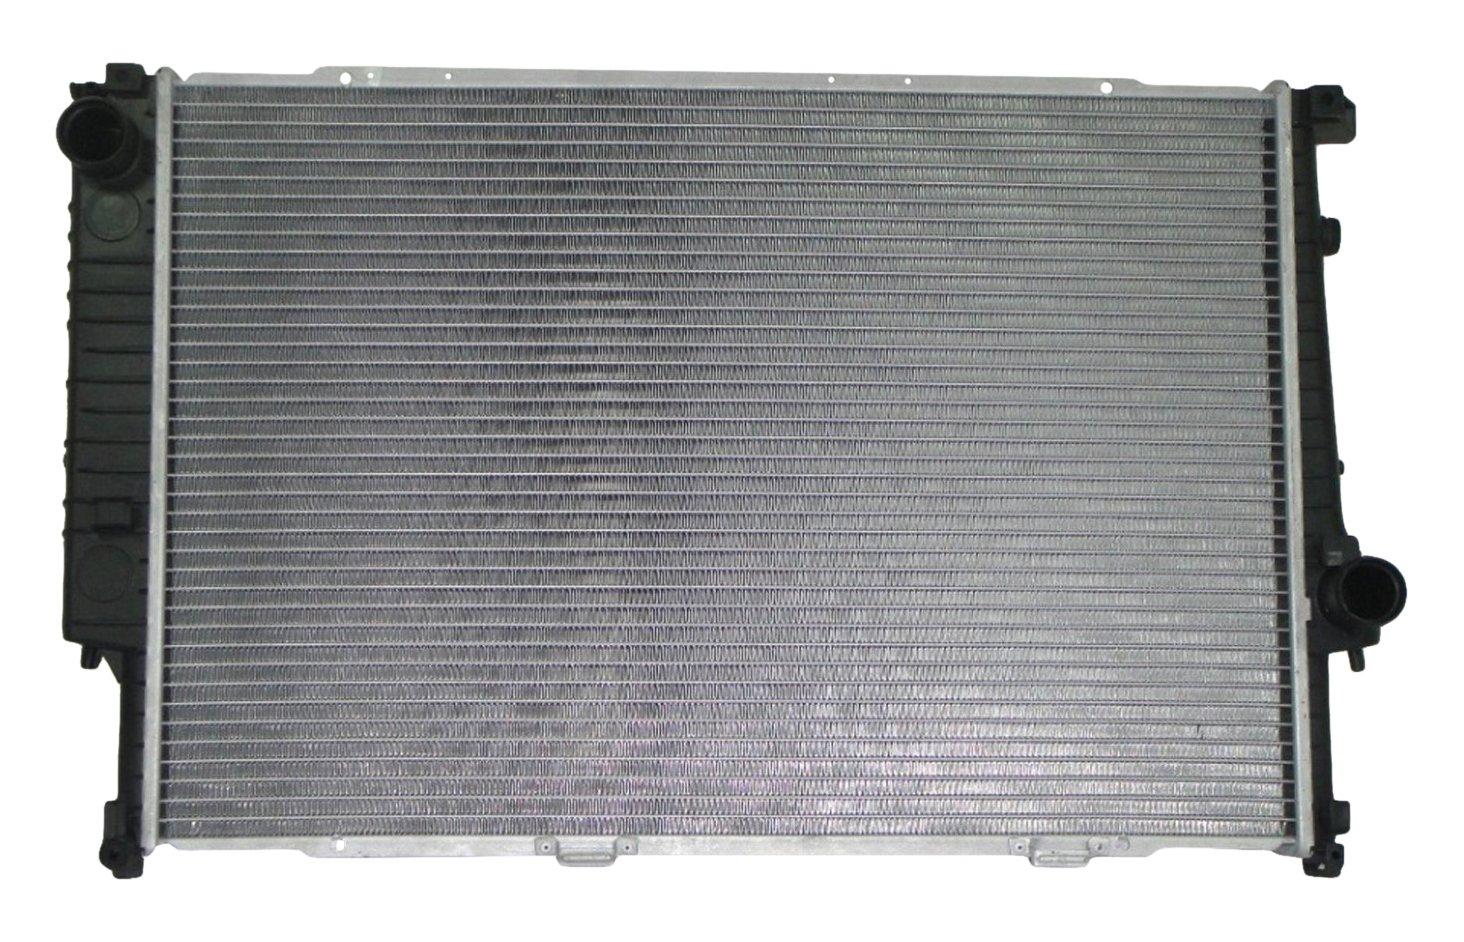 2013 Audi TT RS Roadster Beige Loop Driver /& Passenger Floor GGBAILEY D51086-F1A-BG-LP Custom Fit Car Mats for 2012